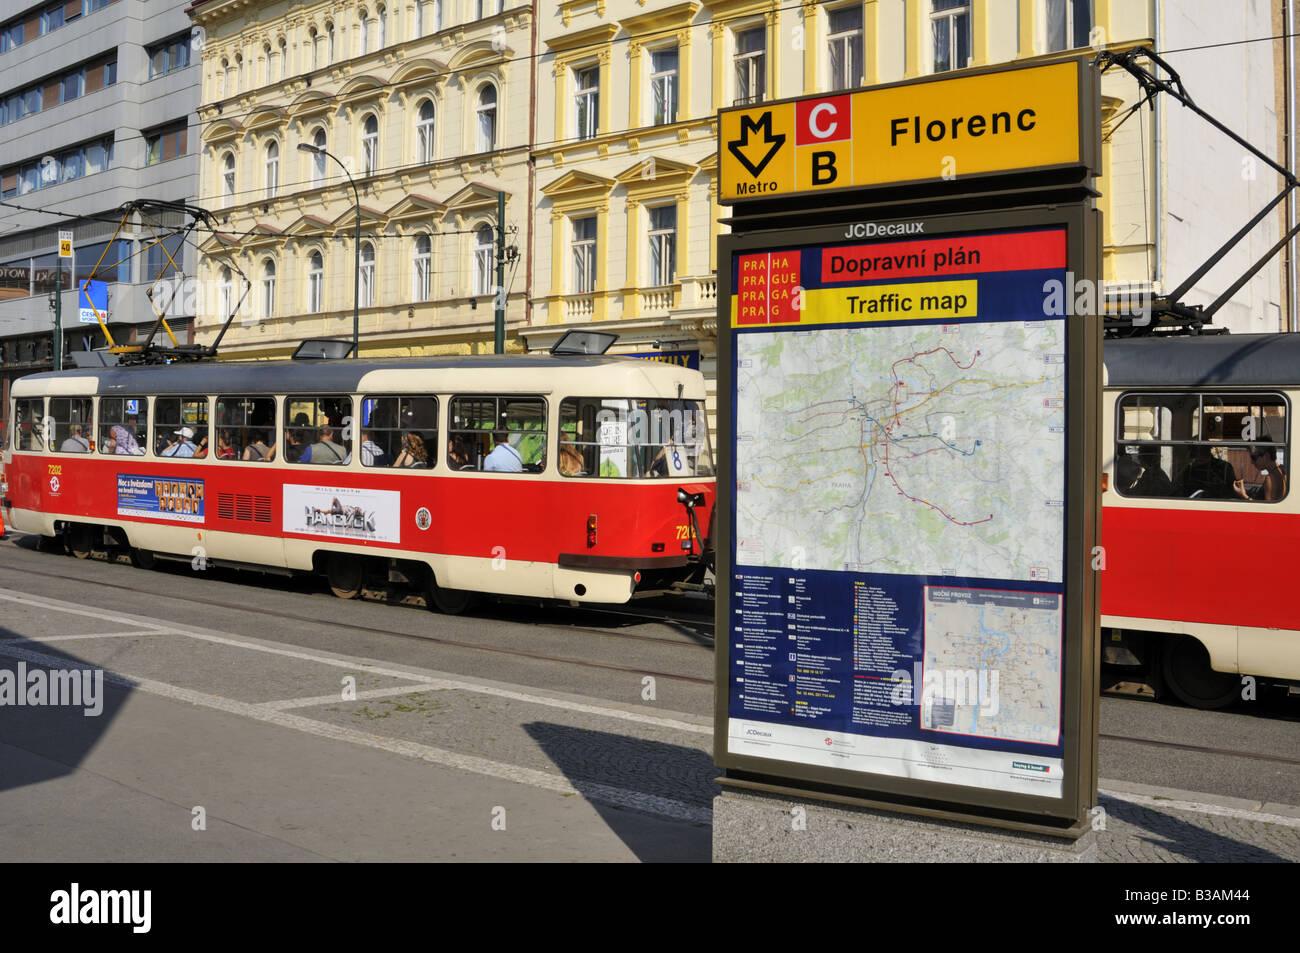 Number 8 Tram At The Florenc Metro Stop On Sokolovska Street In The Prague  Karlin District